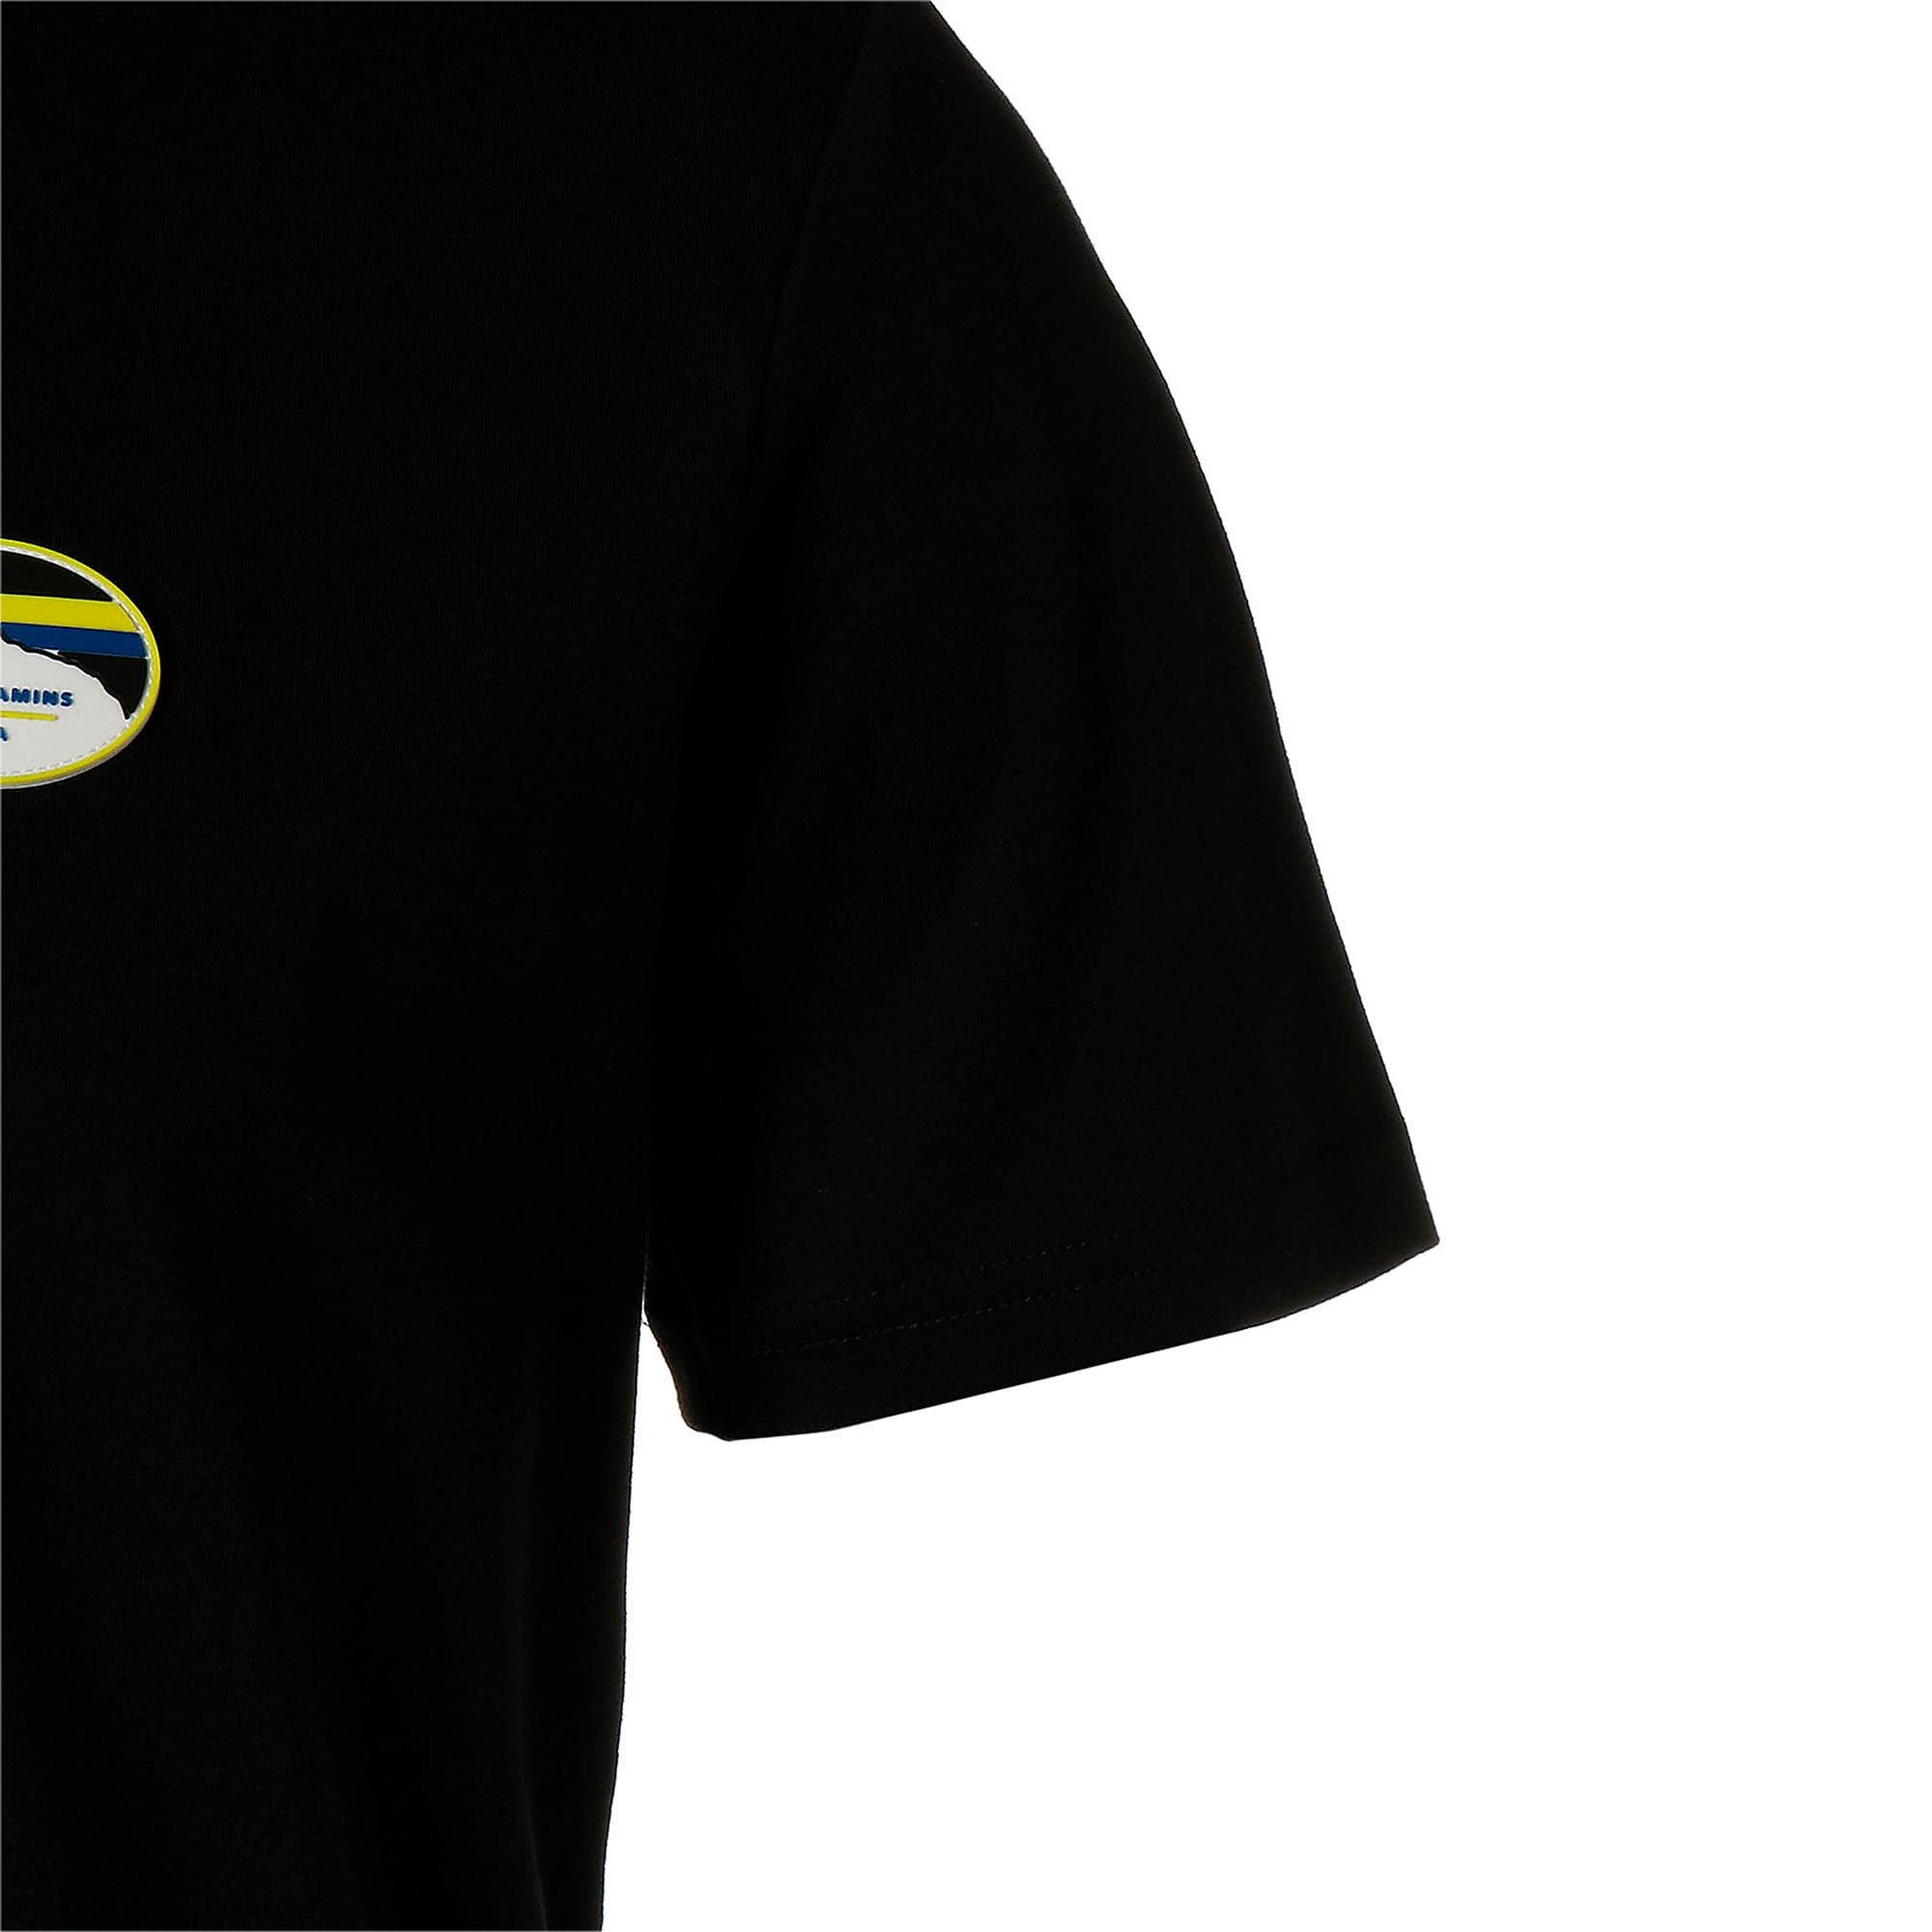 Thumbnail 8 of PUMA x LES BENJAMINS Tシャツ, Puma Black, medium-JPN